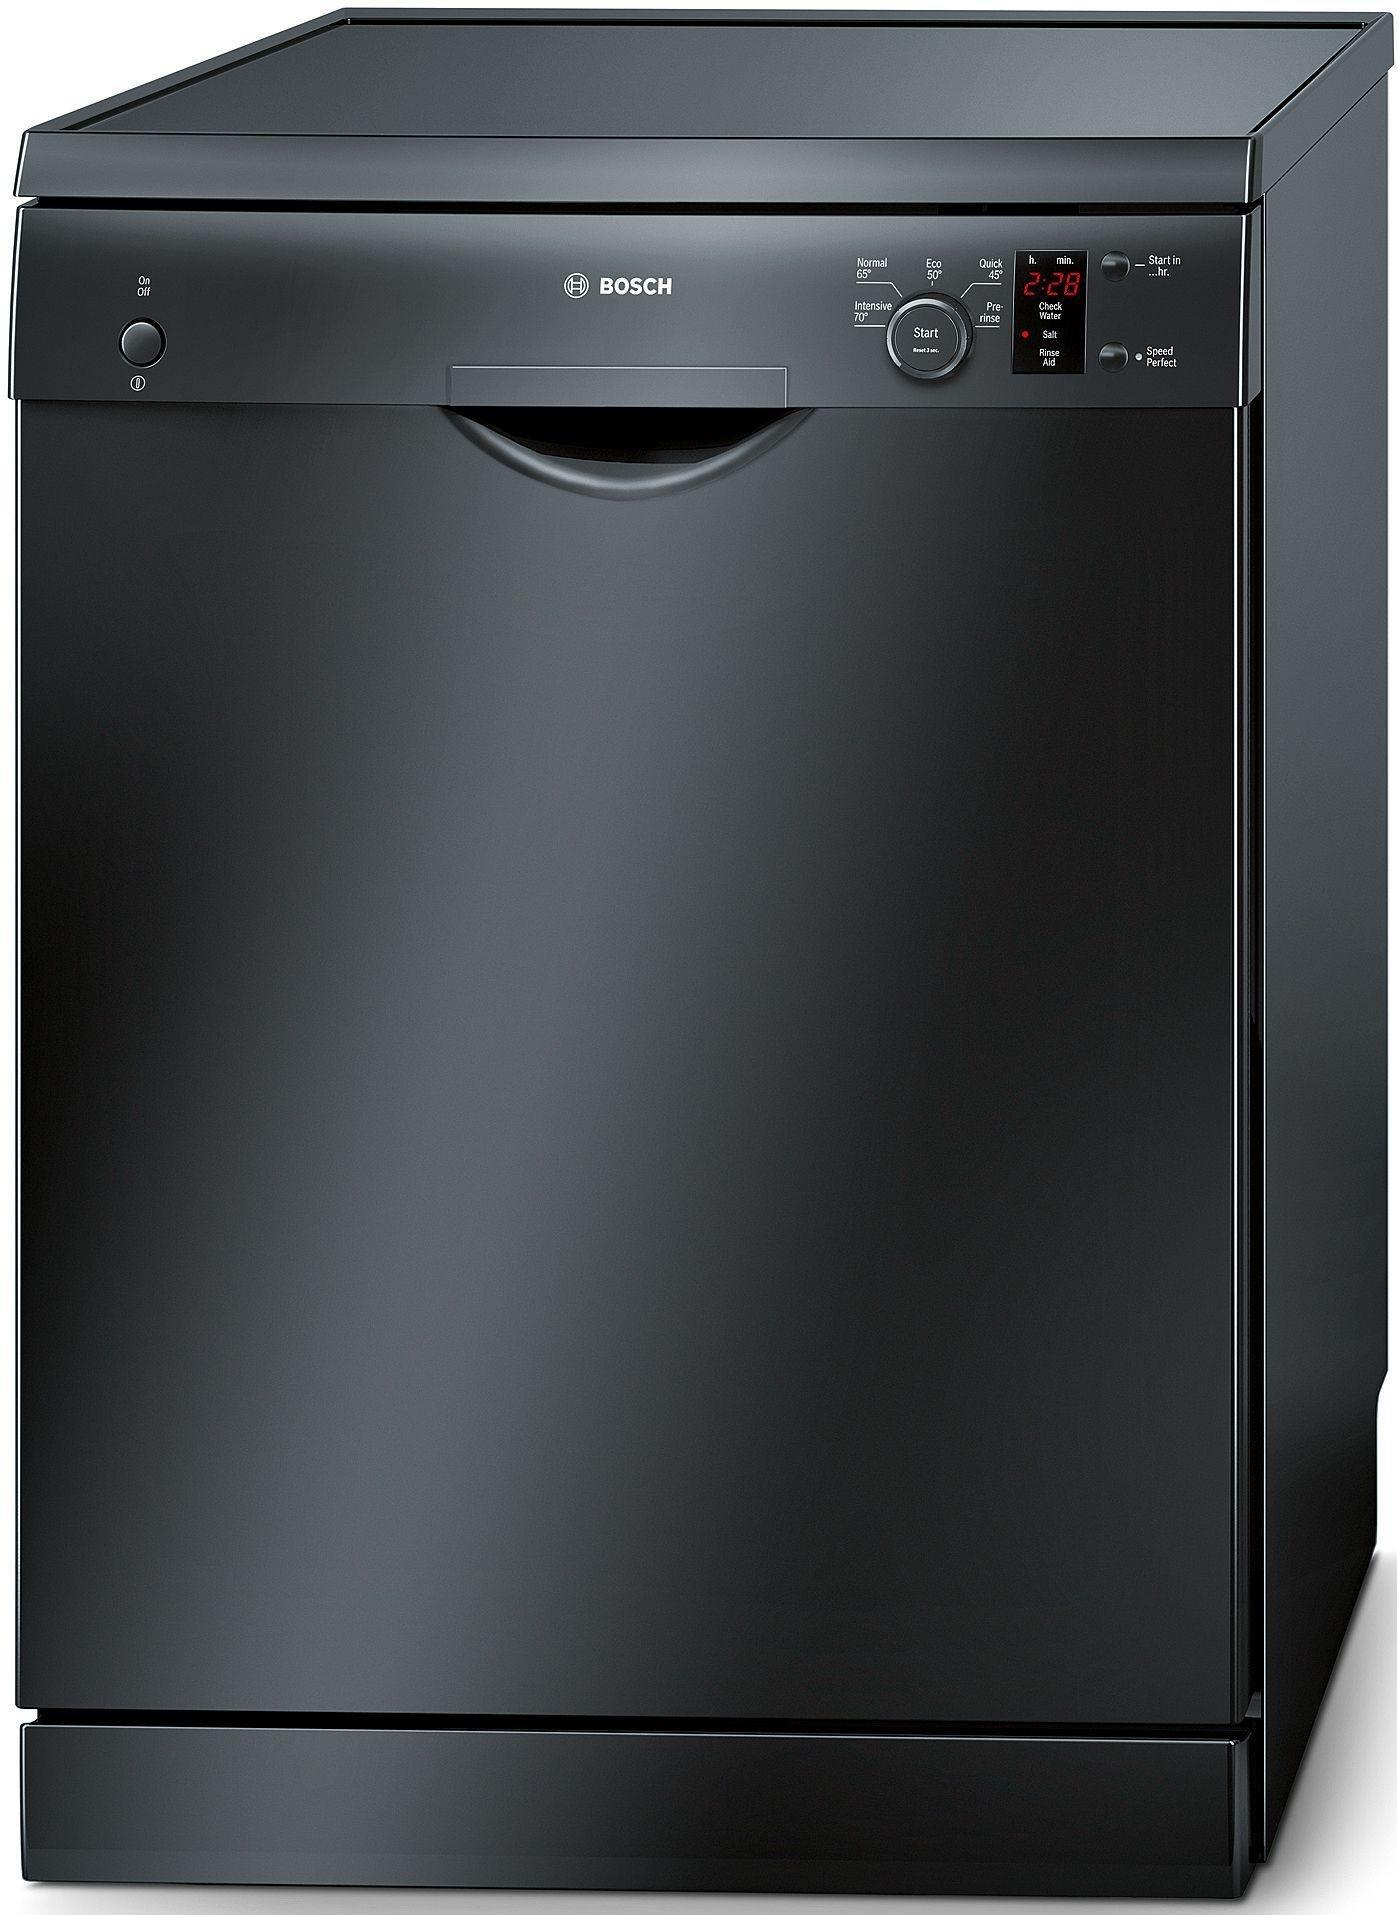 Image of Bosch SMS50T06GB Freestanding Full Size Dishwasher - Black.